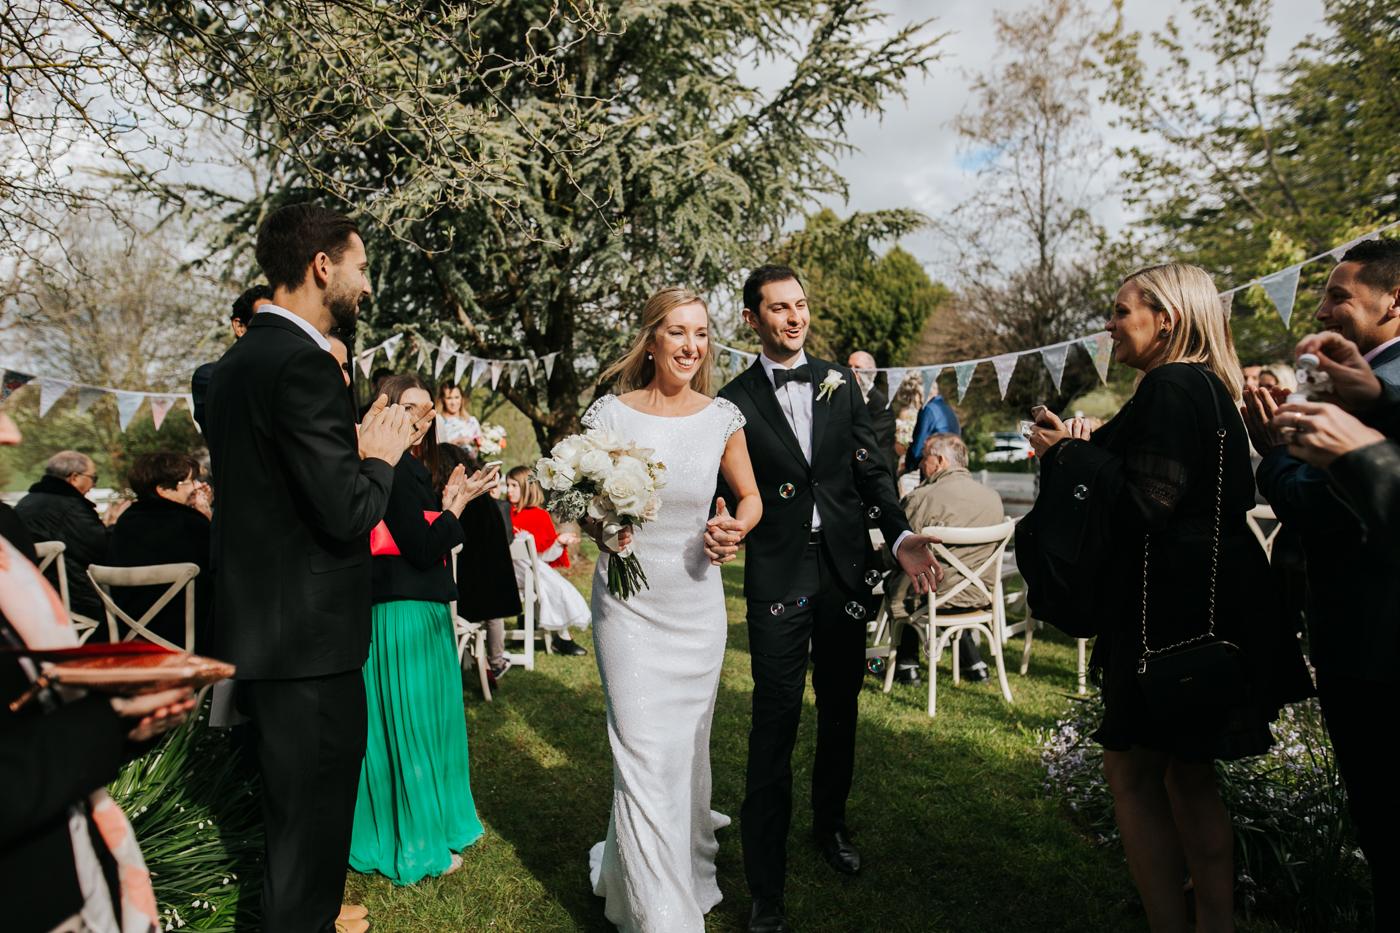 Bridget & James - Orange Country Wedding - Samantha Heather Photography-56.jpg